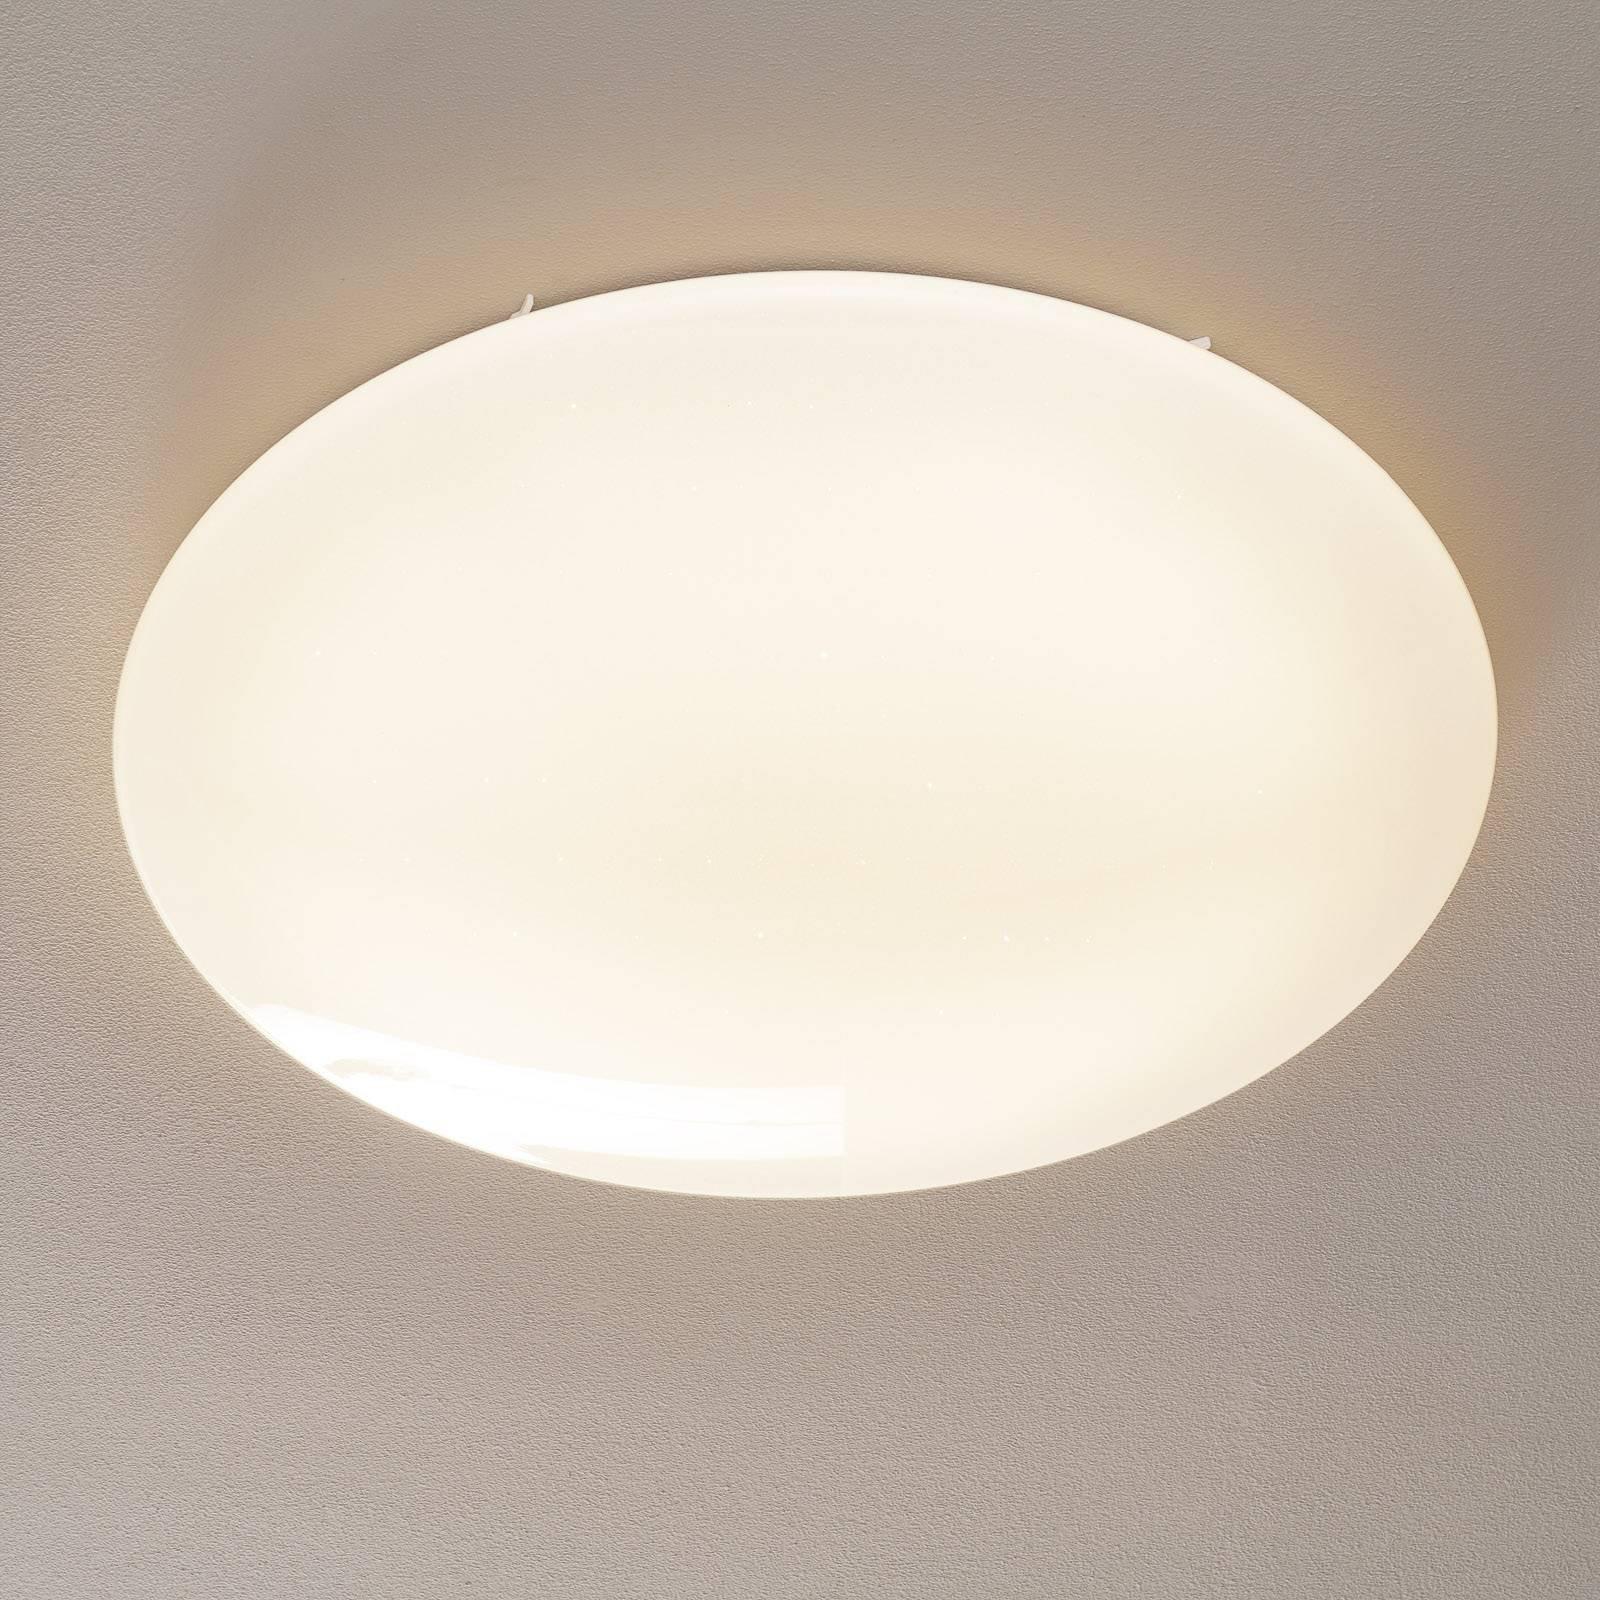 EGLO connect Totari-C LED-taklampe krystall CCT